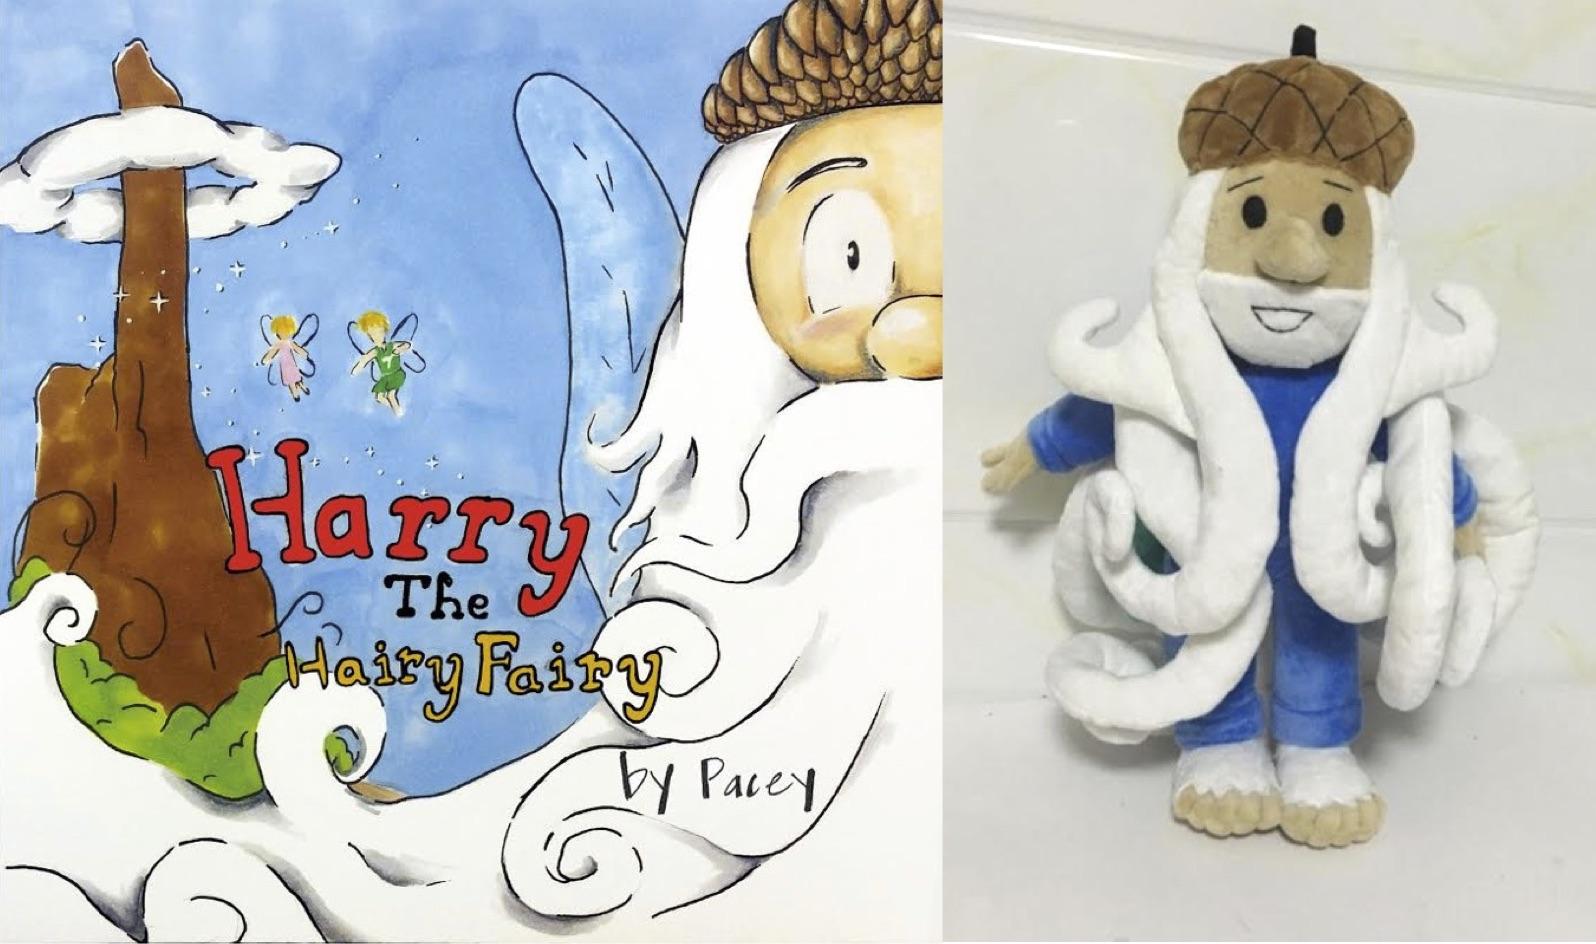 hairy the hairy fairy stuffed animal